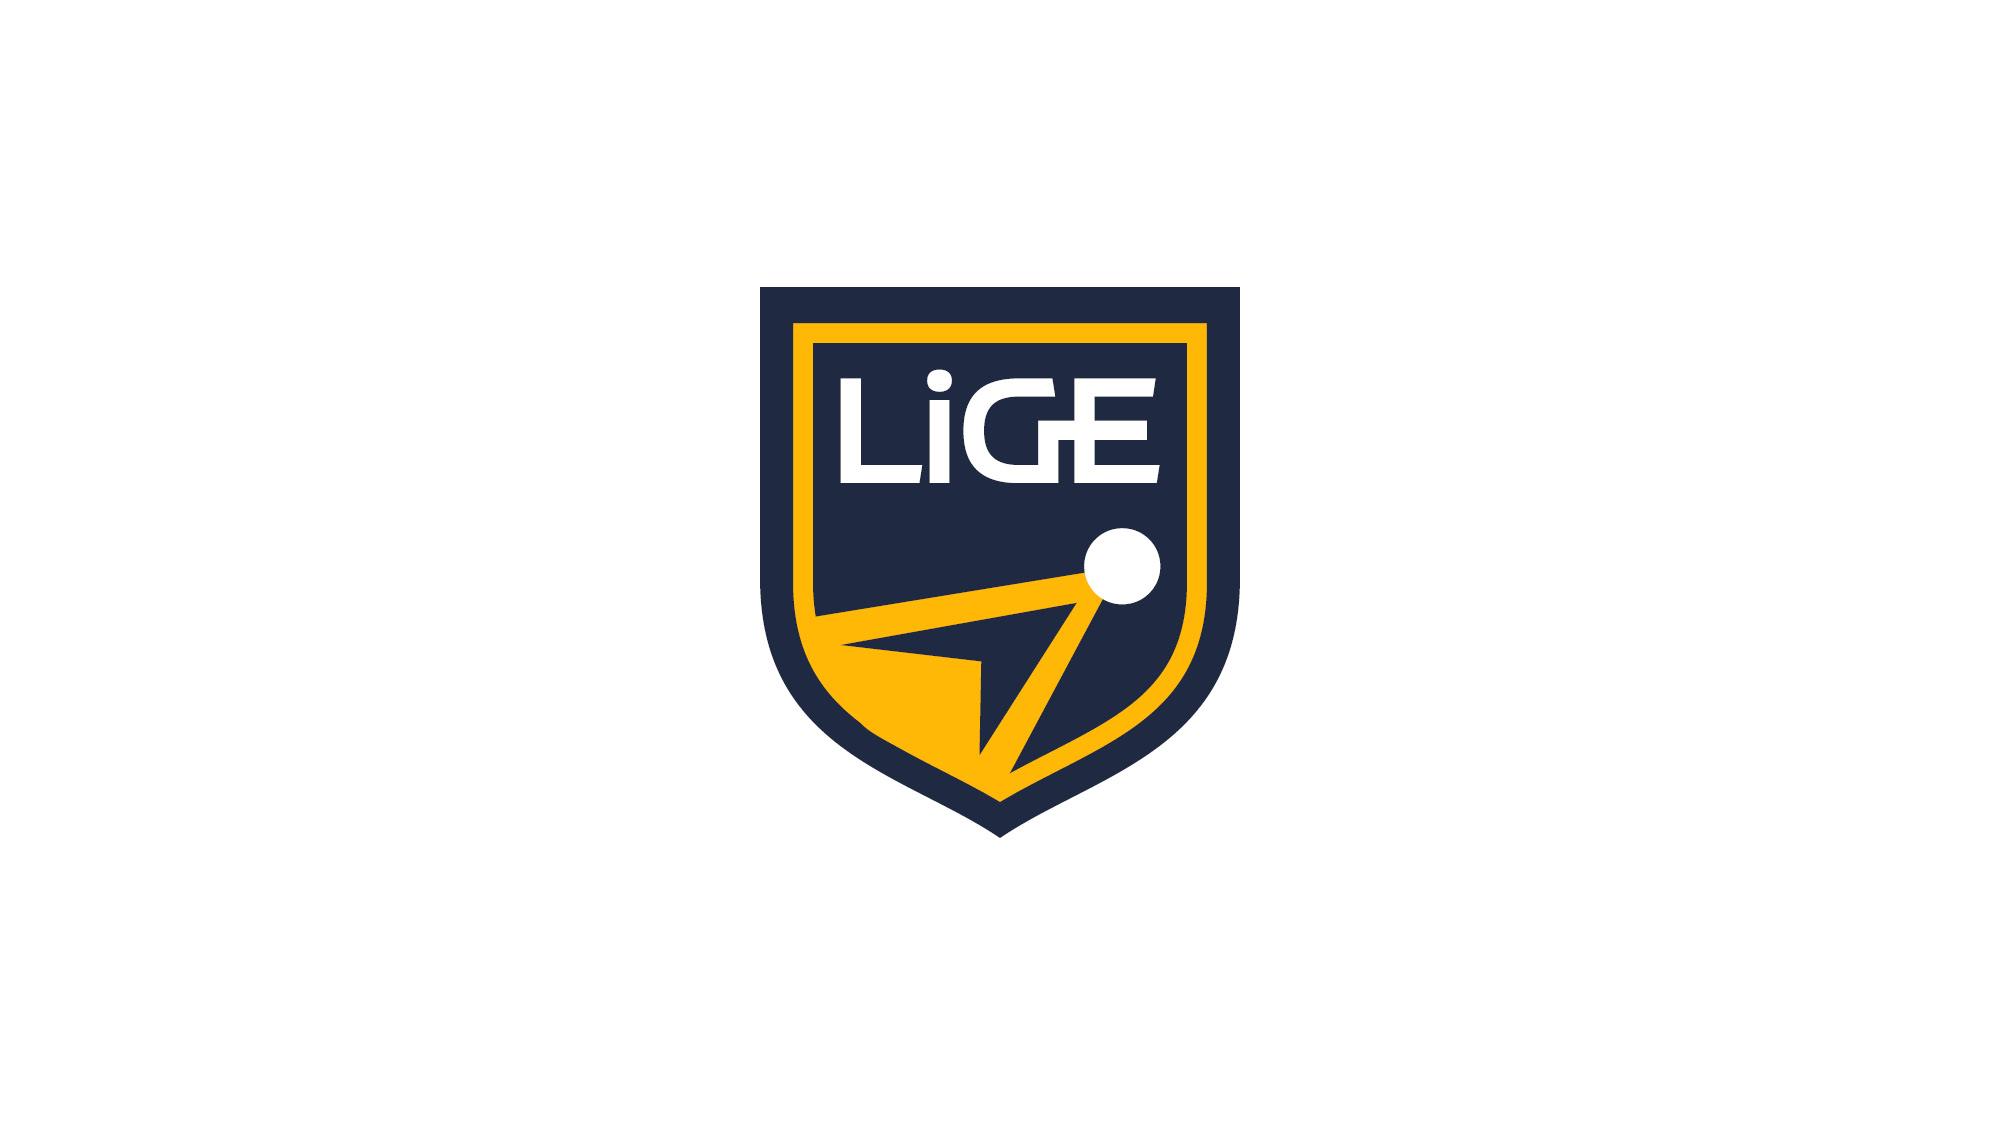 Lige-FGV-SP-Nacione-Branding4